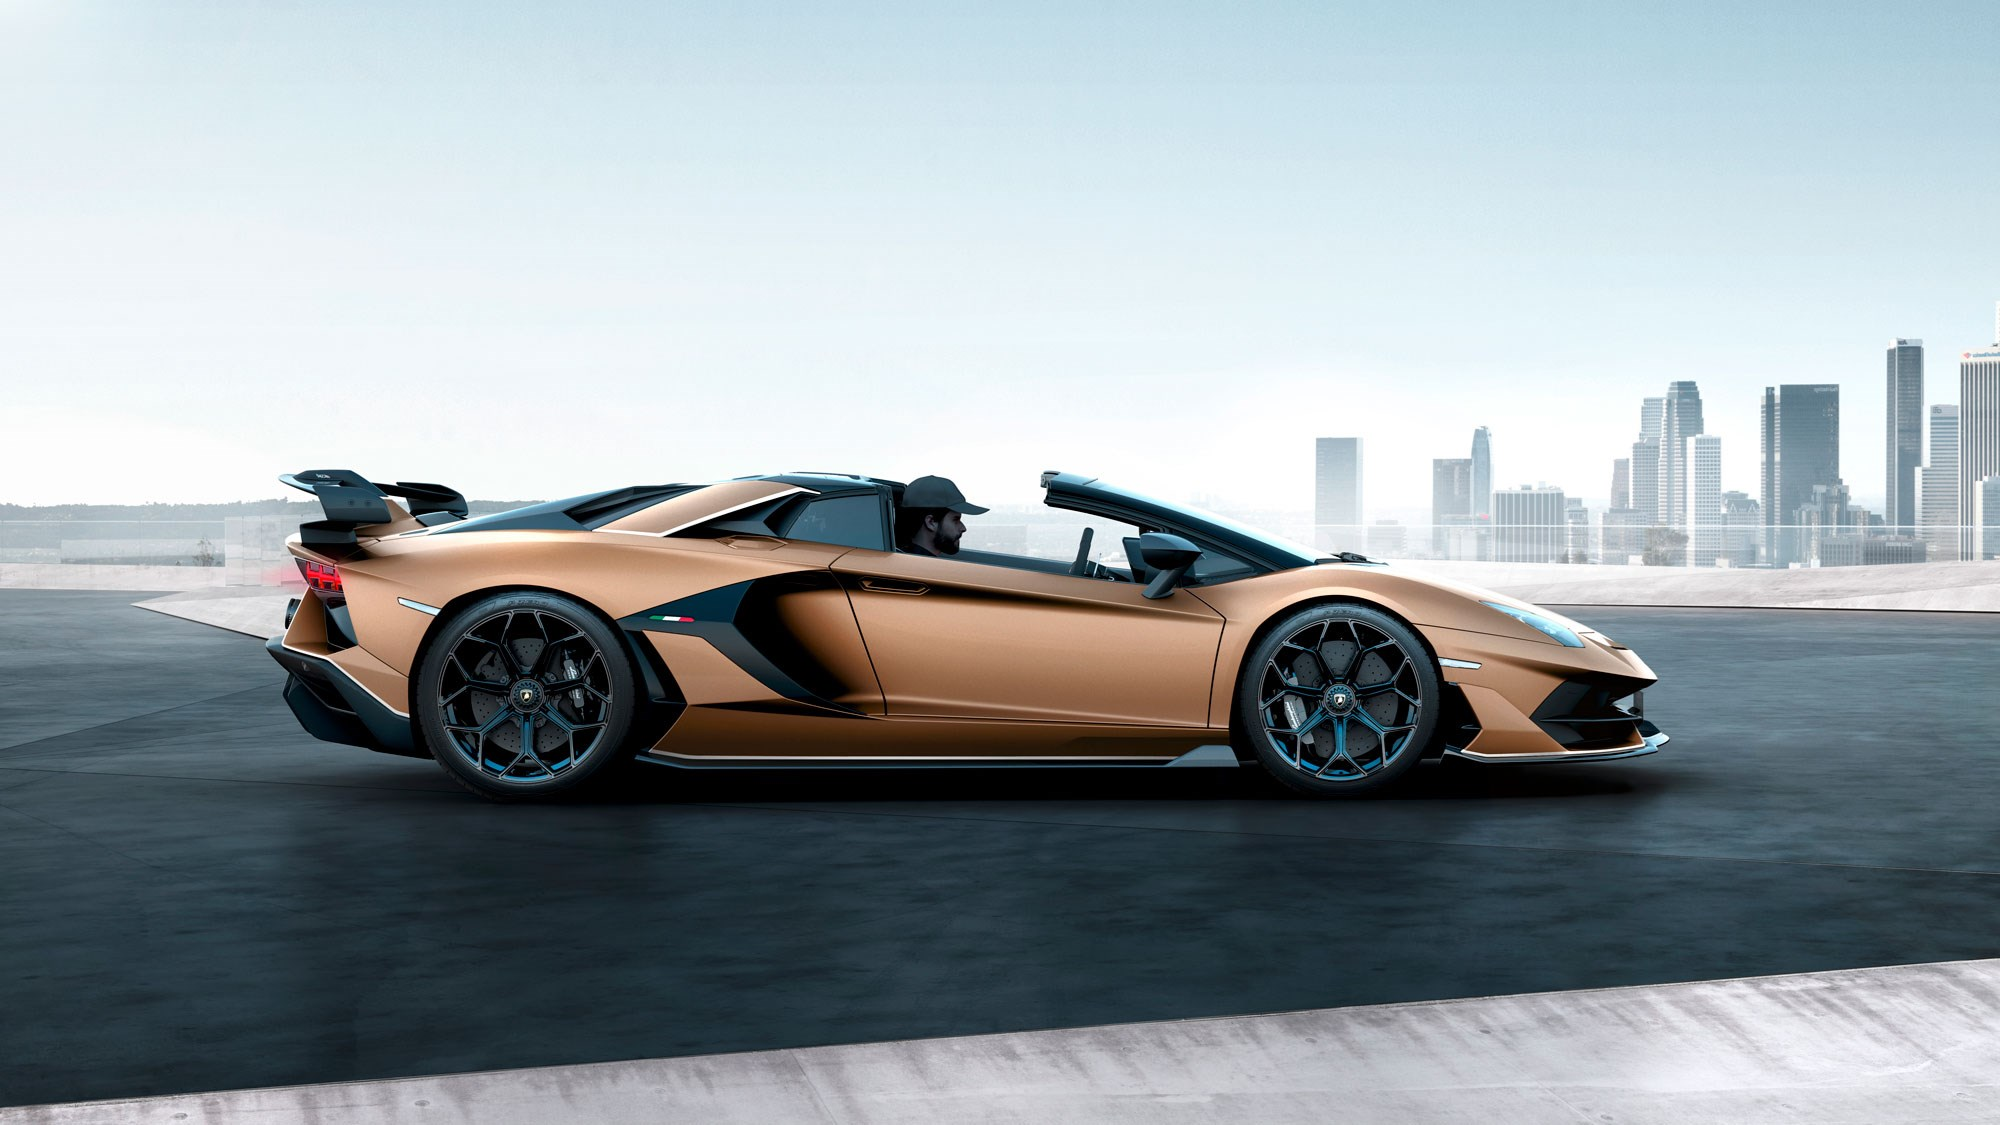 Outrageous 217mph Lamborghini Aventador Svj Roadster Chops Its Top